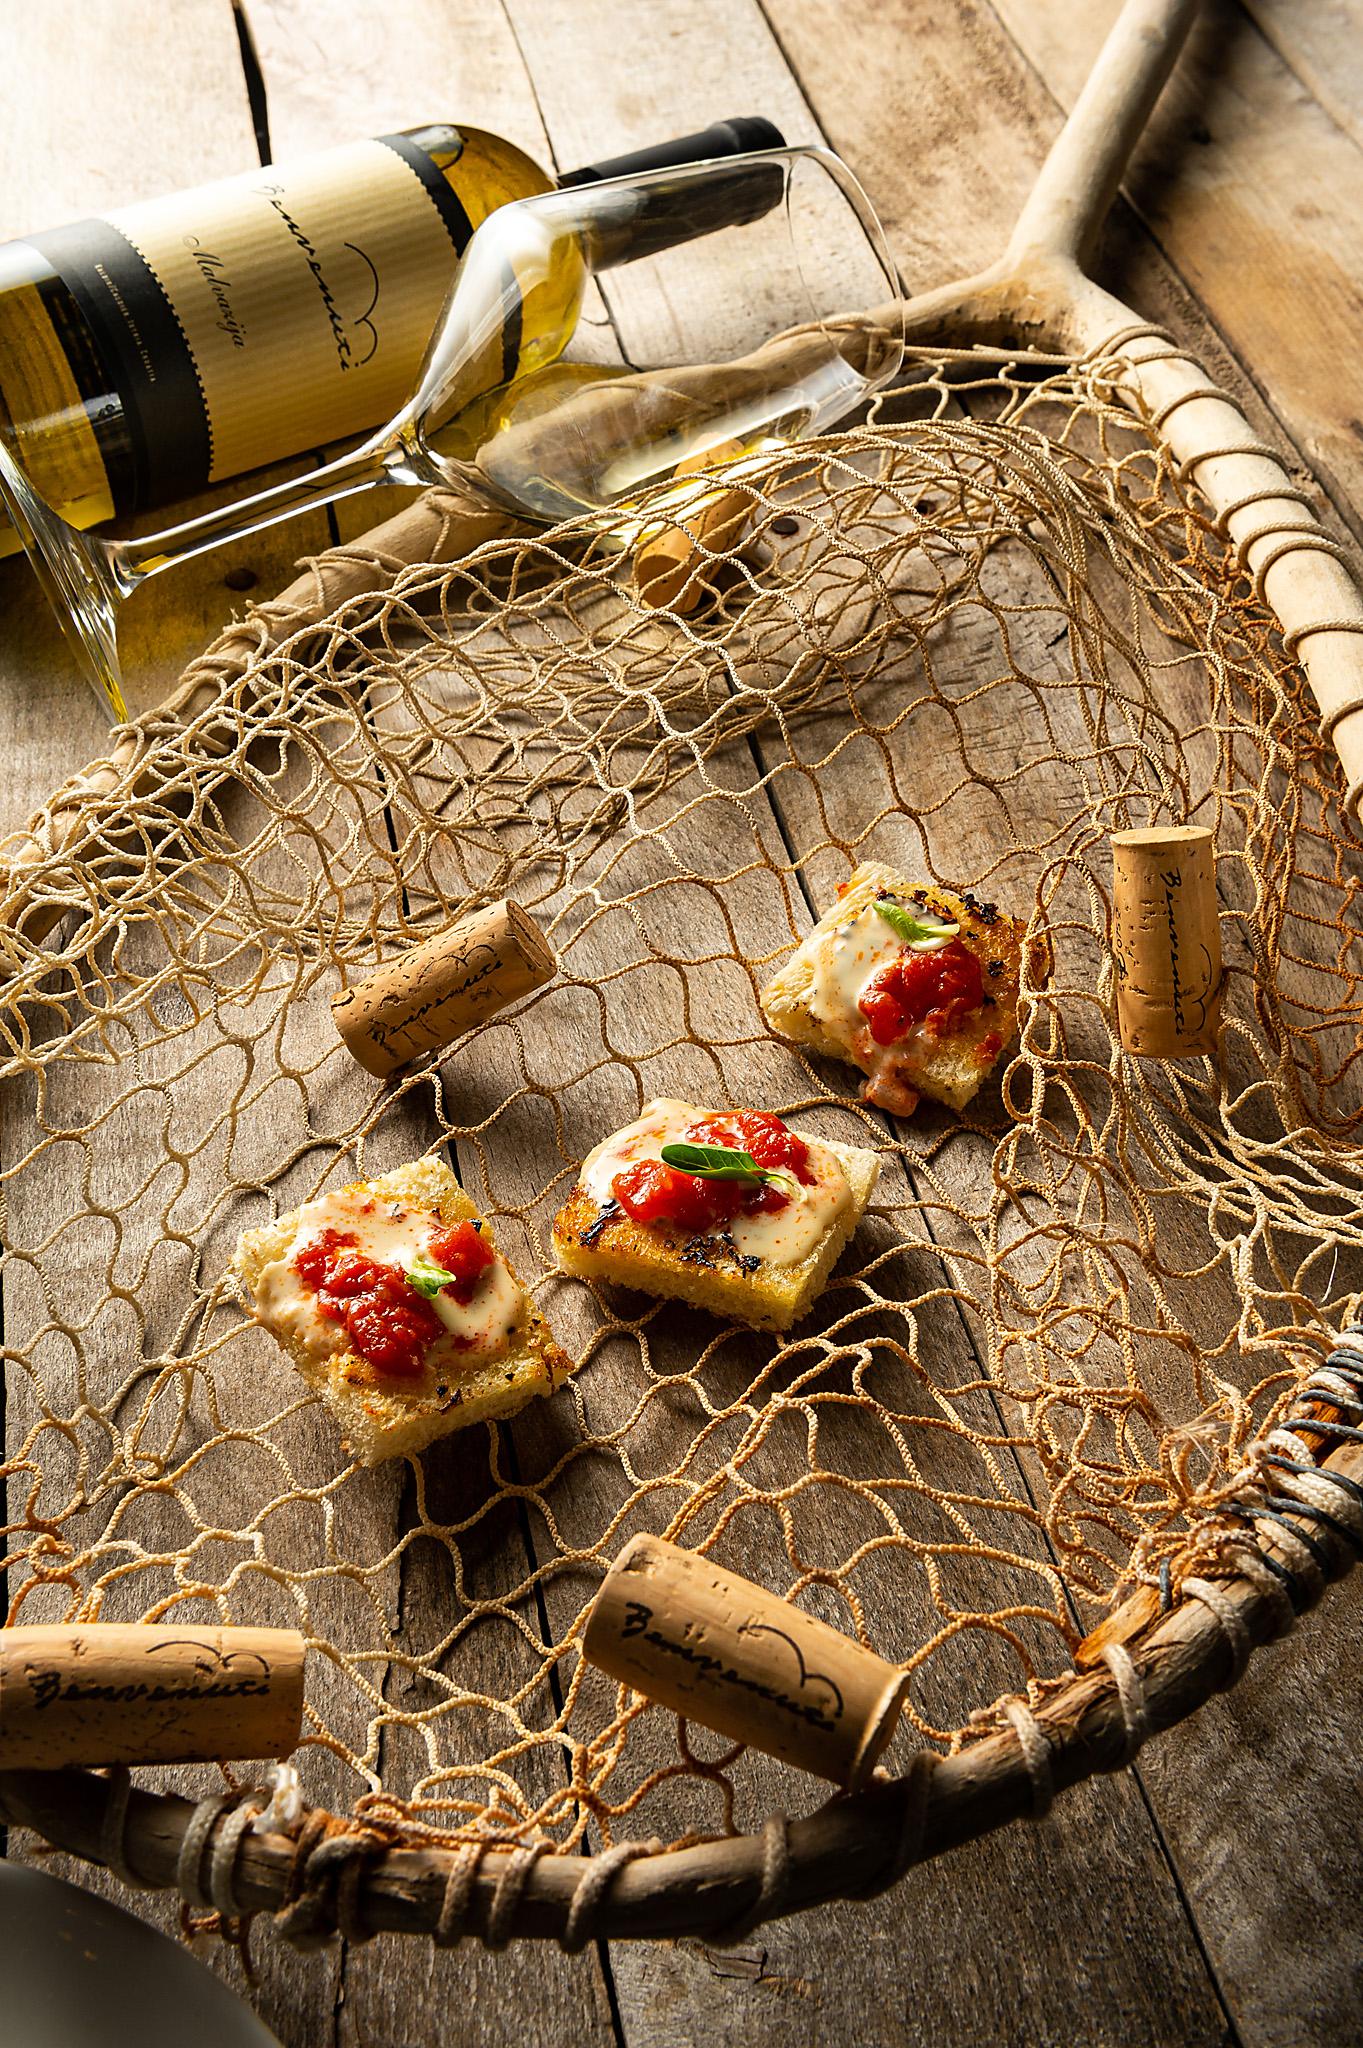 hren | plethora of creativity // Benvenuti winery food pairing photography